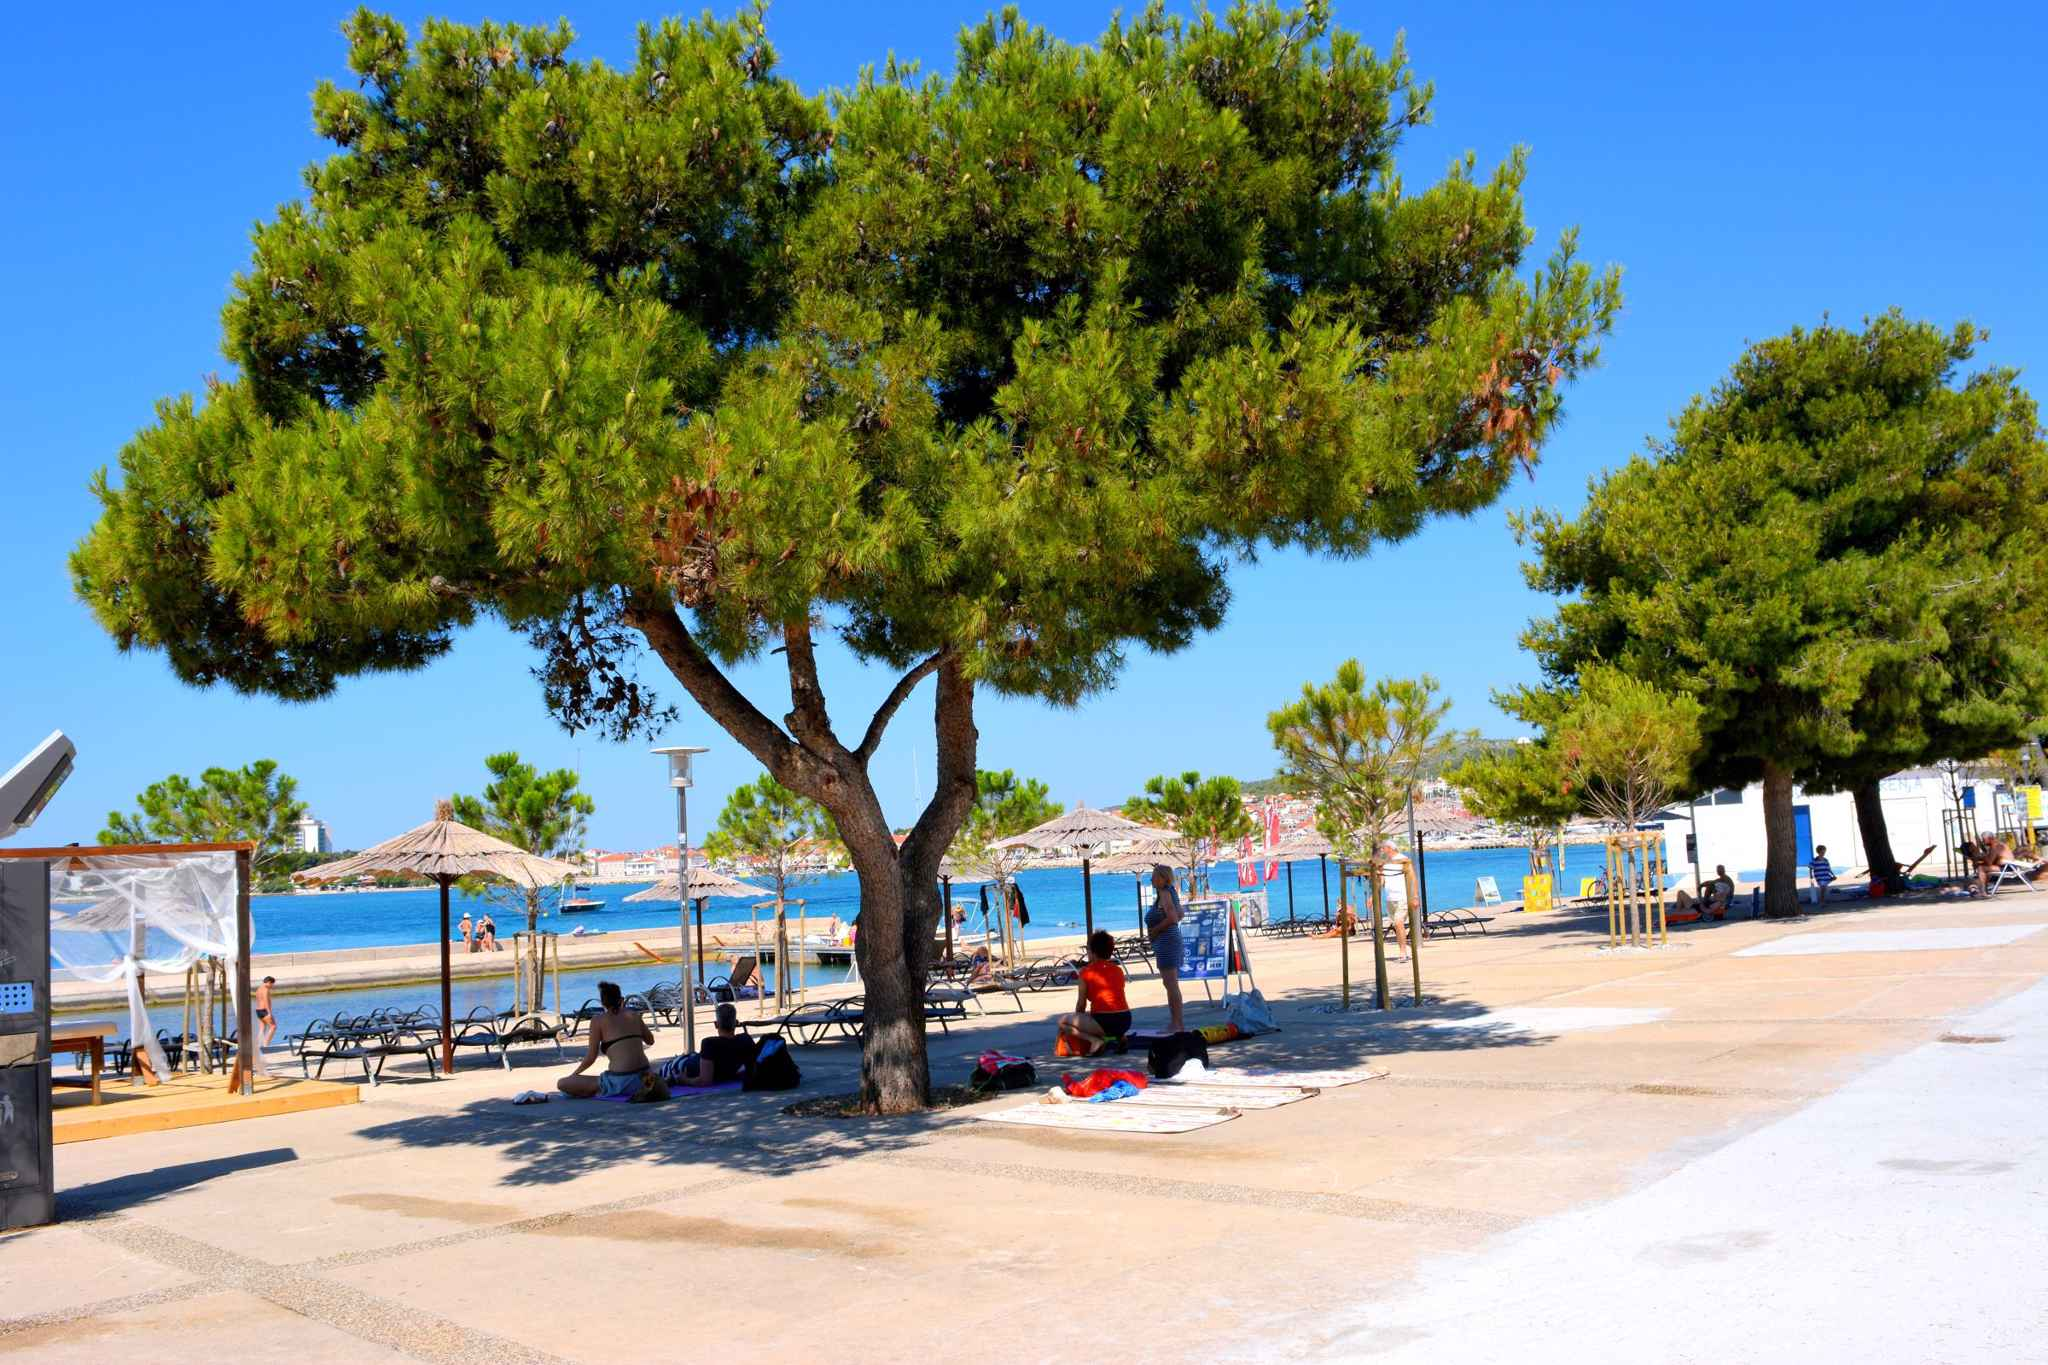 Appartement de vacances mit Terrasse (278776), Vodice, , Dalmatie, Croatie, image 13